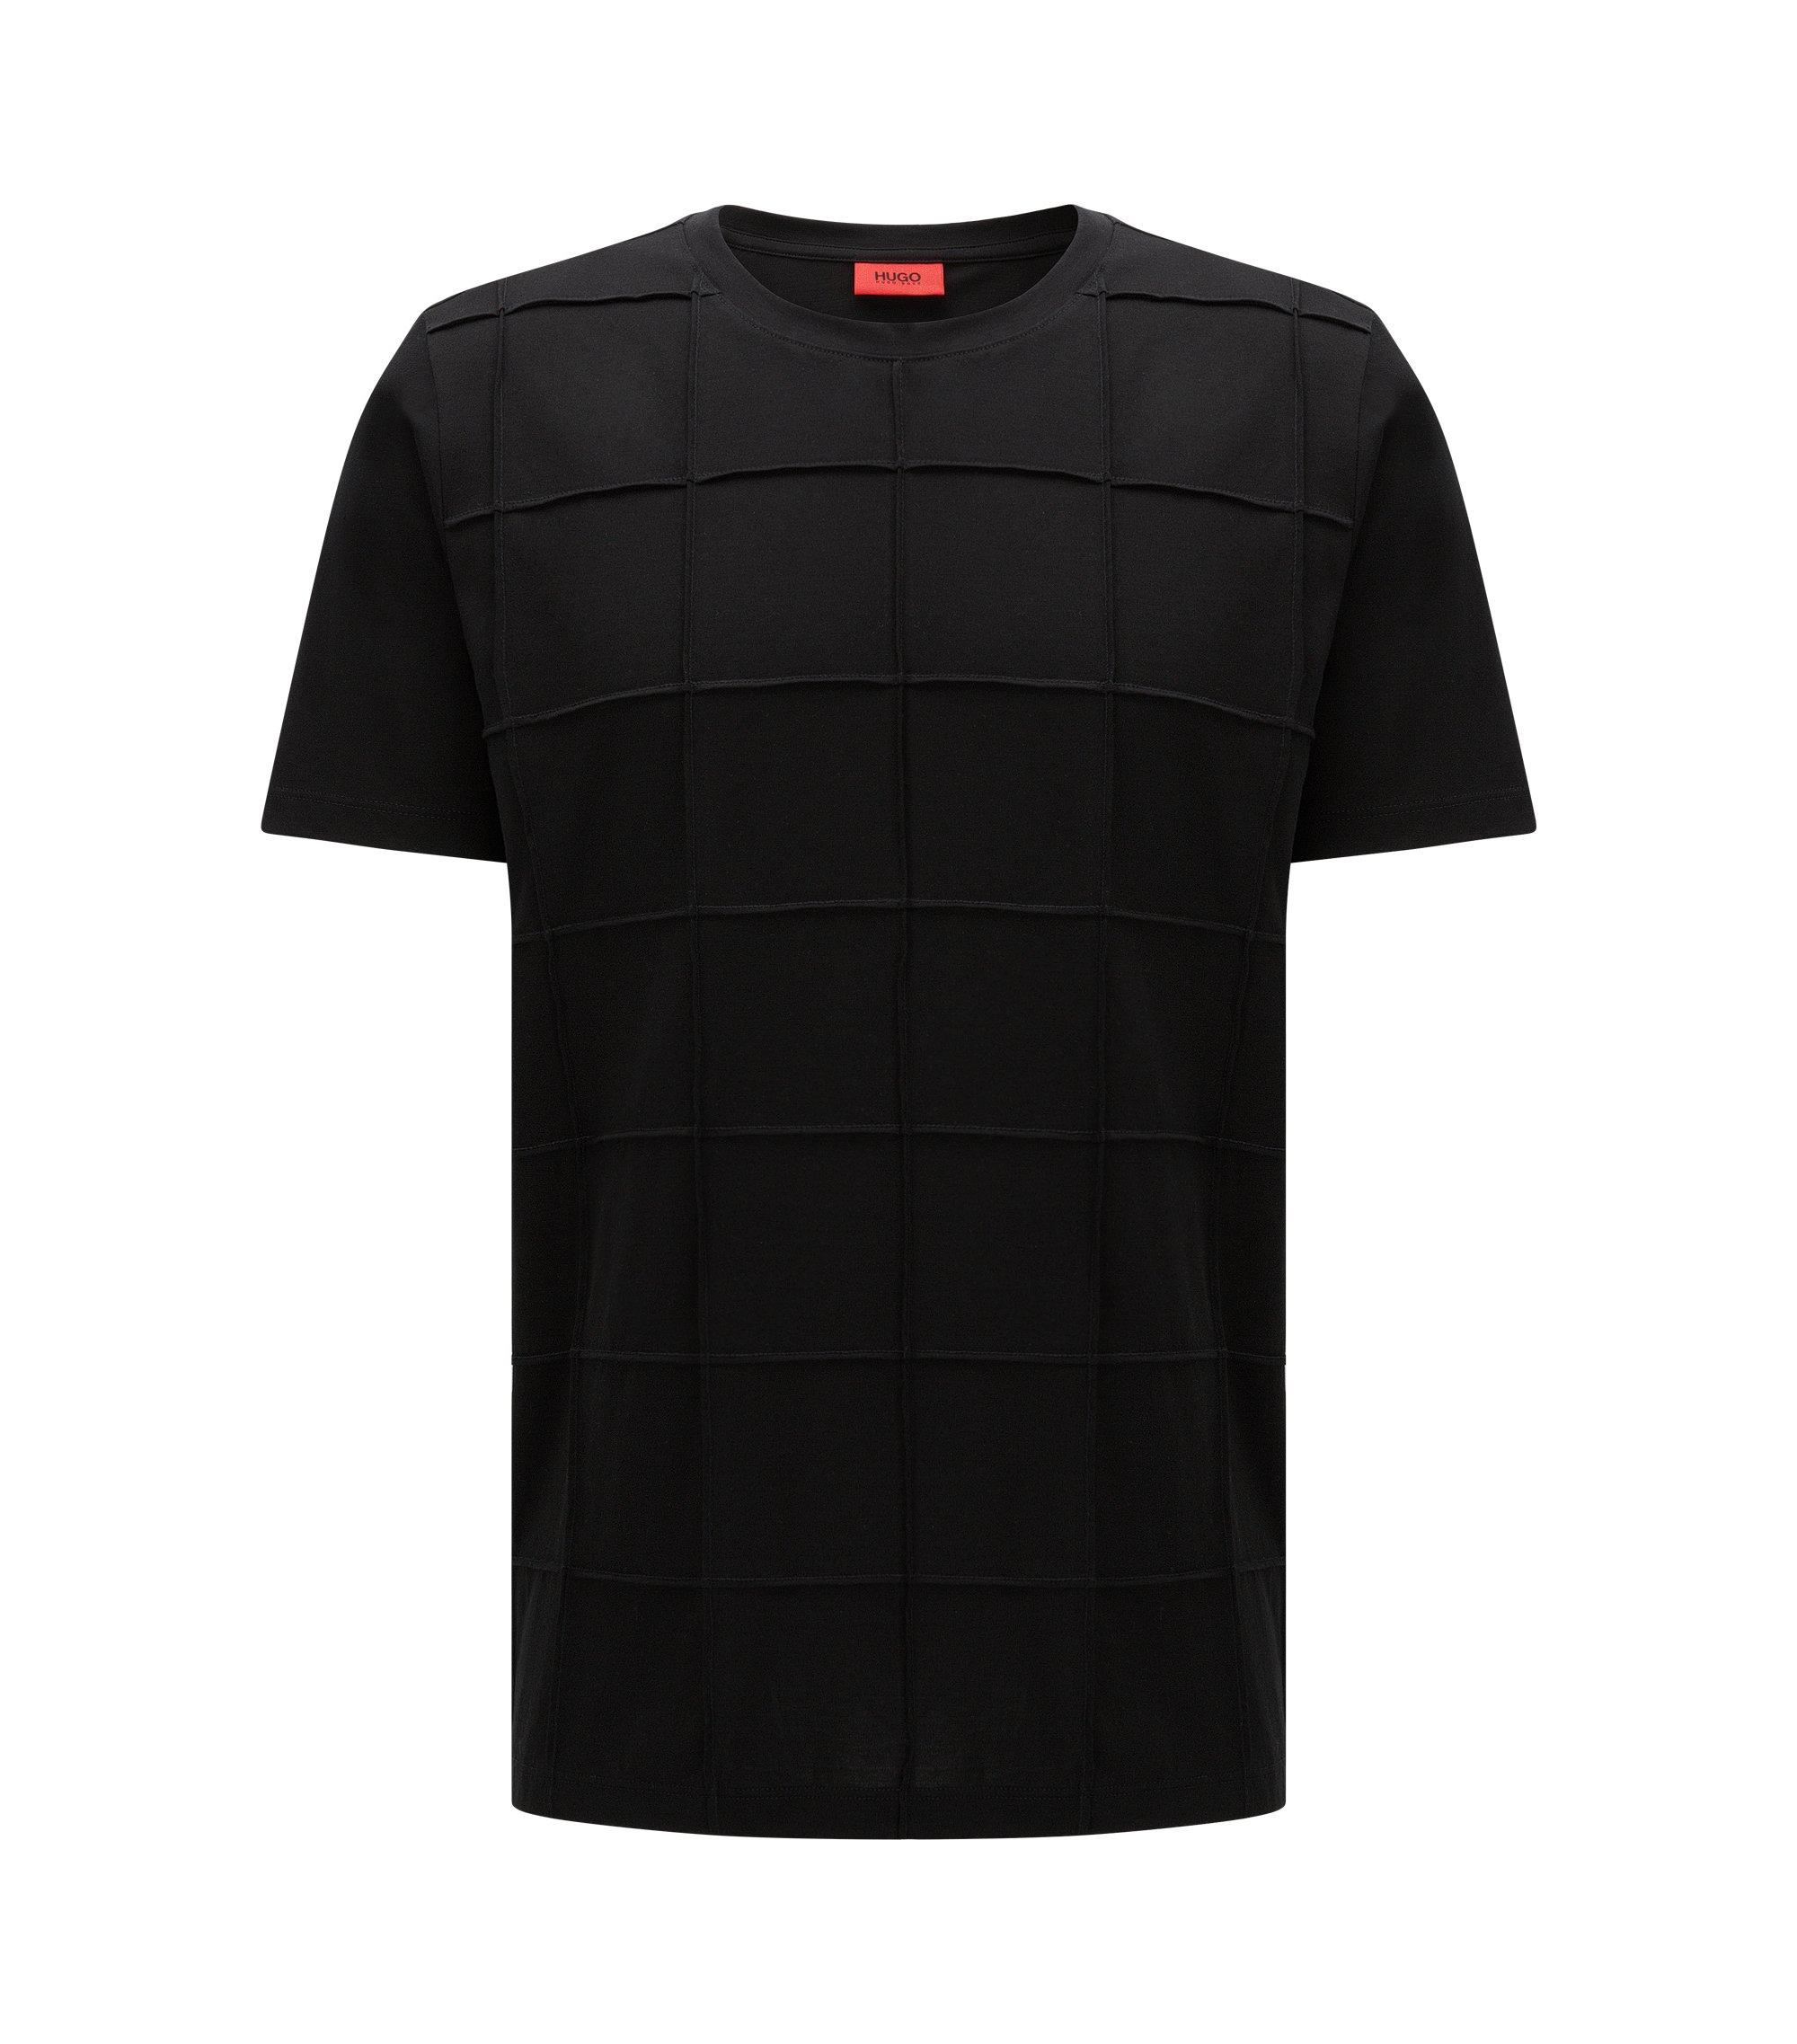 Cotton Pintucked T-Shirt | Devy, Black